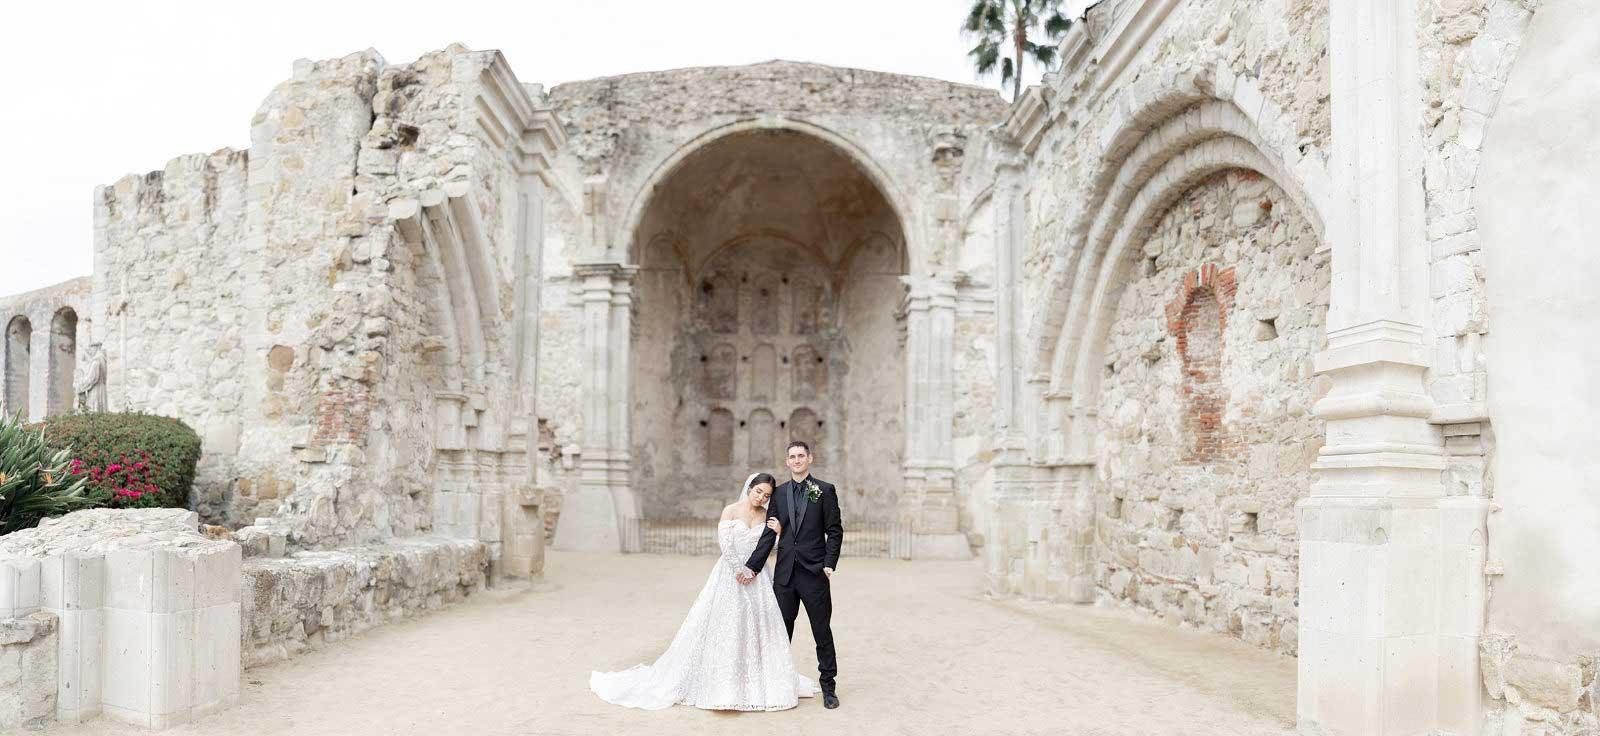 Franciscan Garden Wedding - Hitched Photo 1